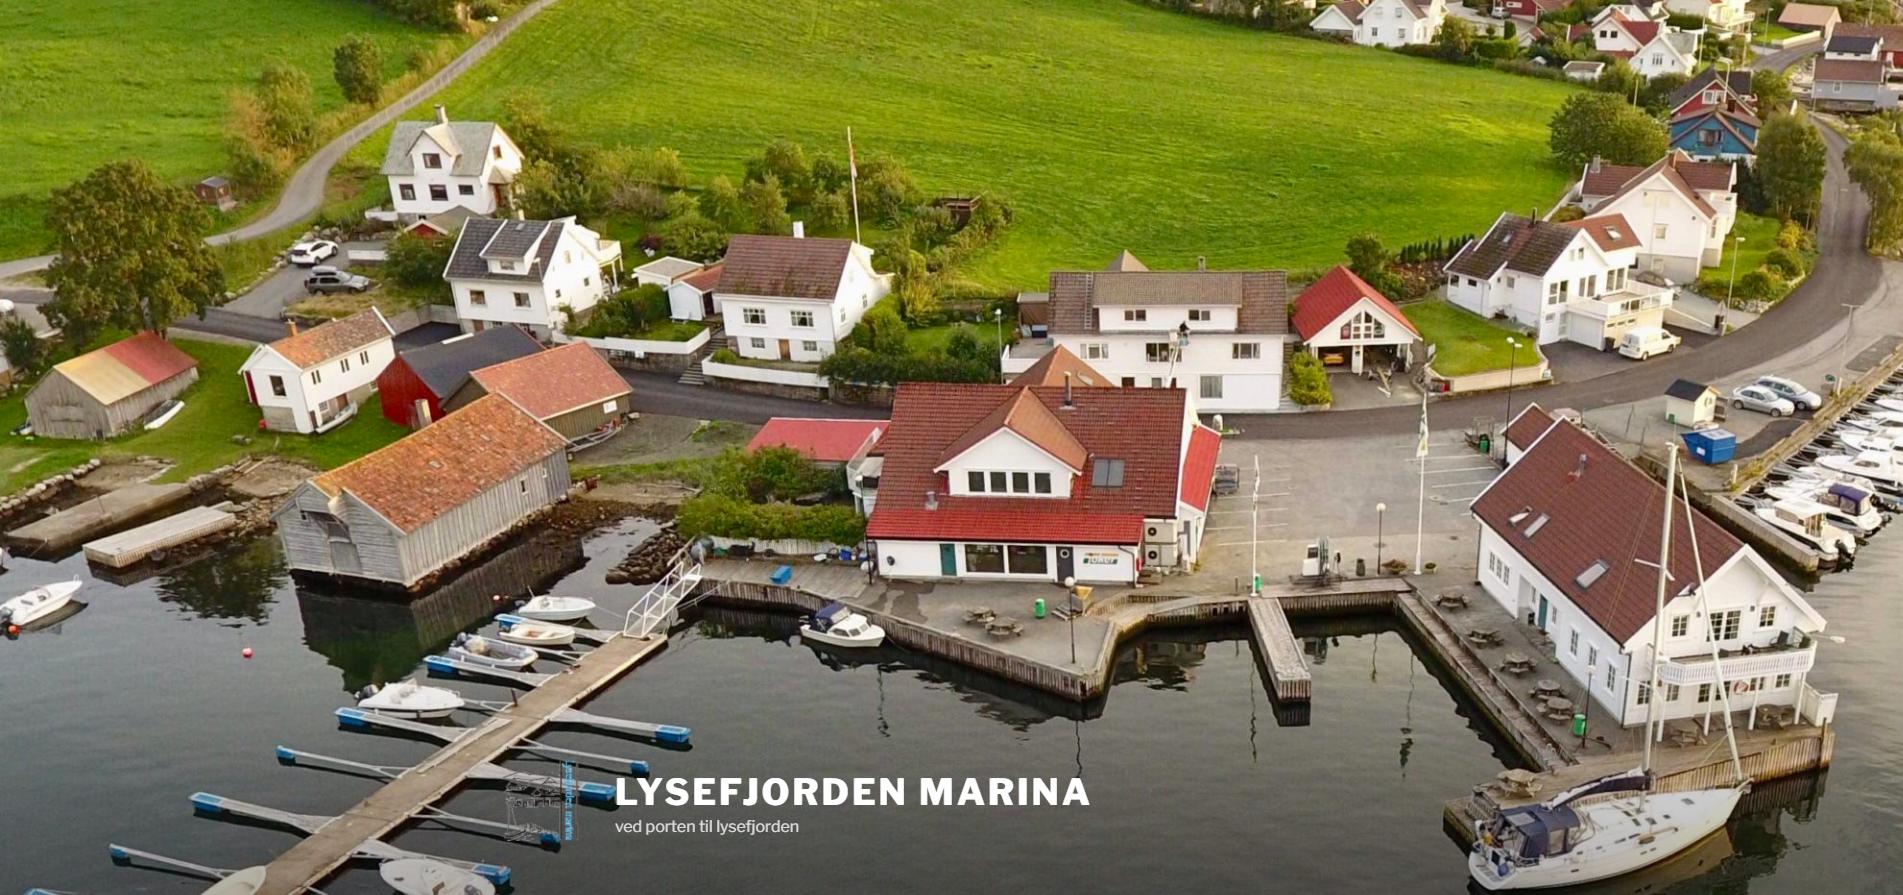 Lysefjorden Marina